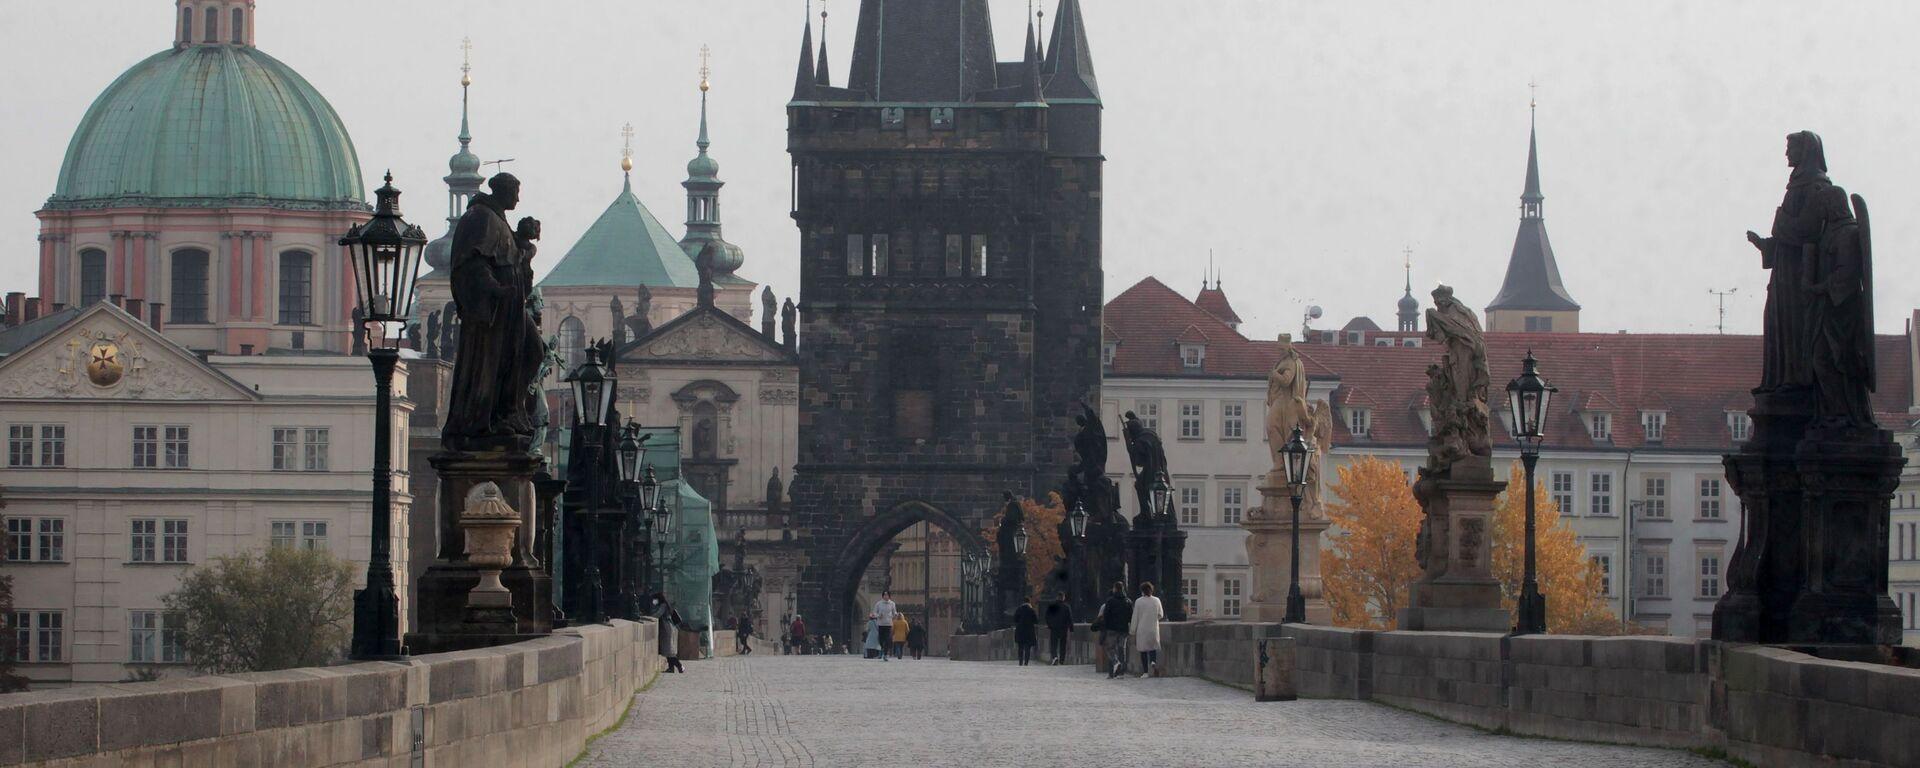 Praha, Karlův most - Sputnik Česká republika, 1920, 11.04.2021